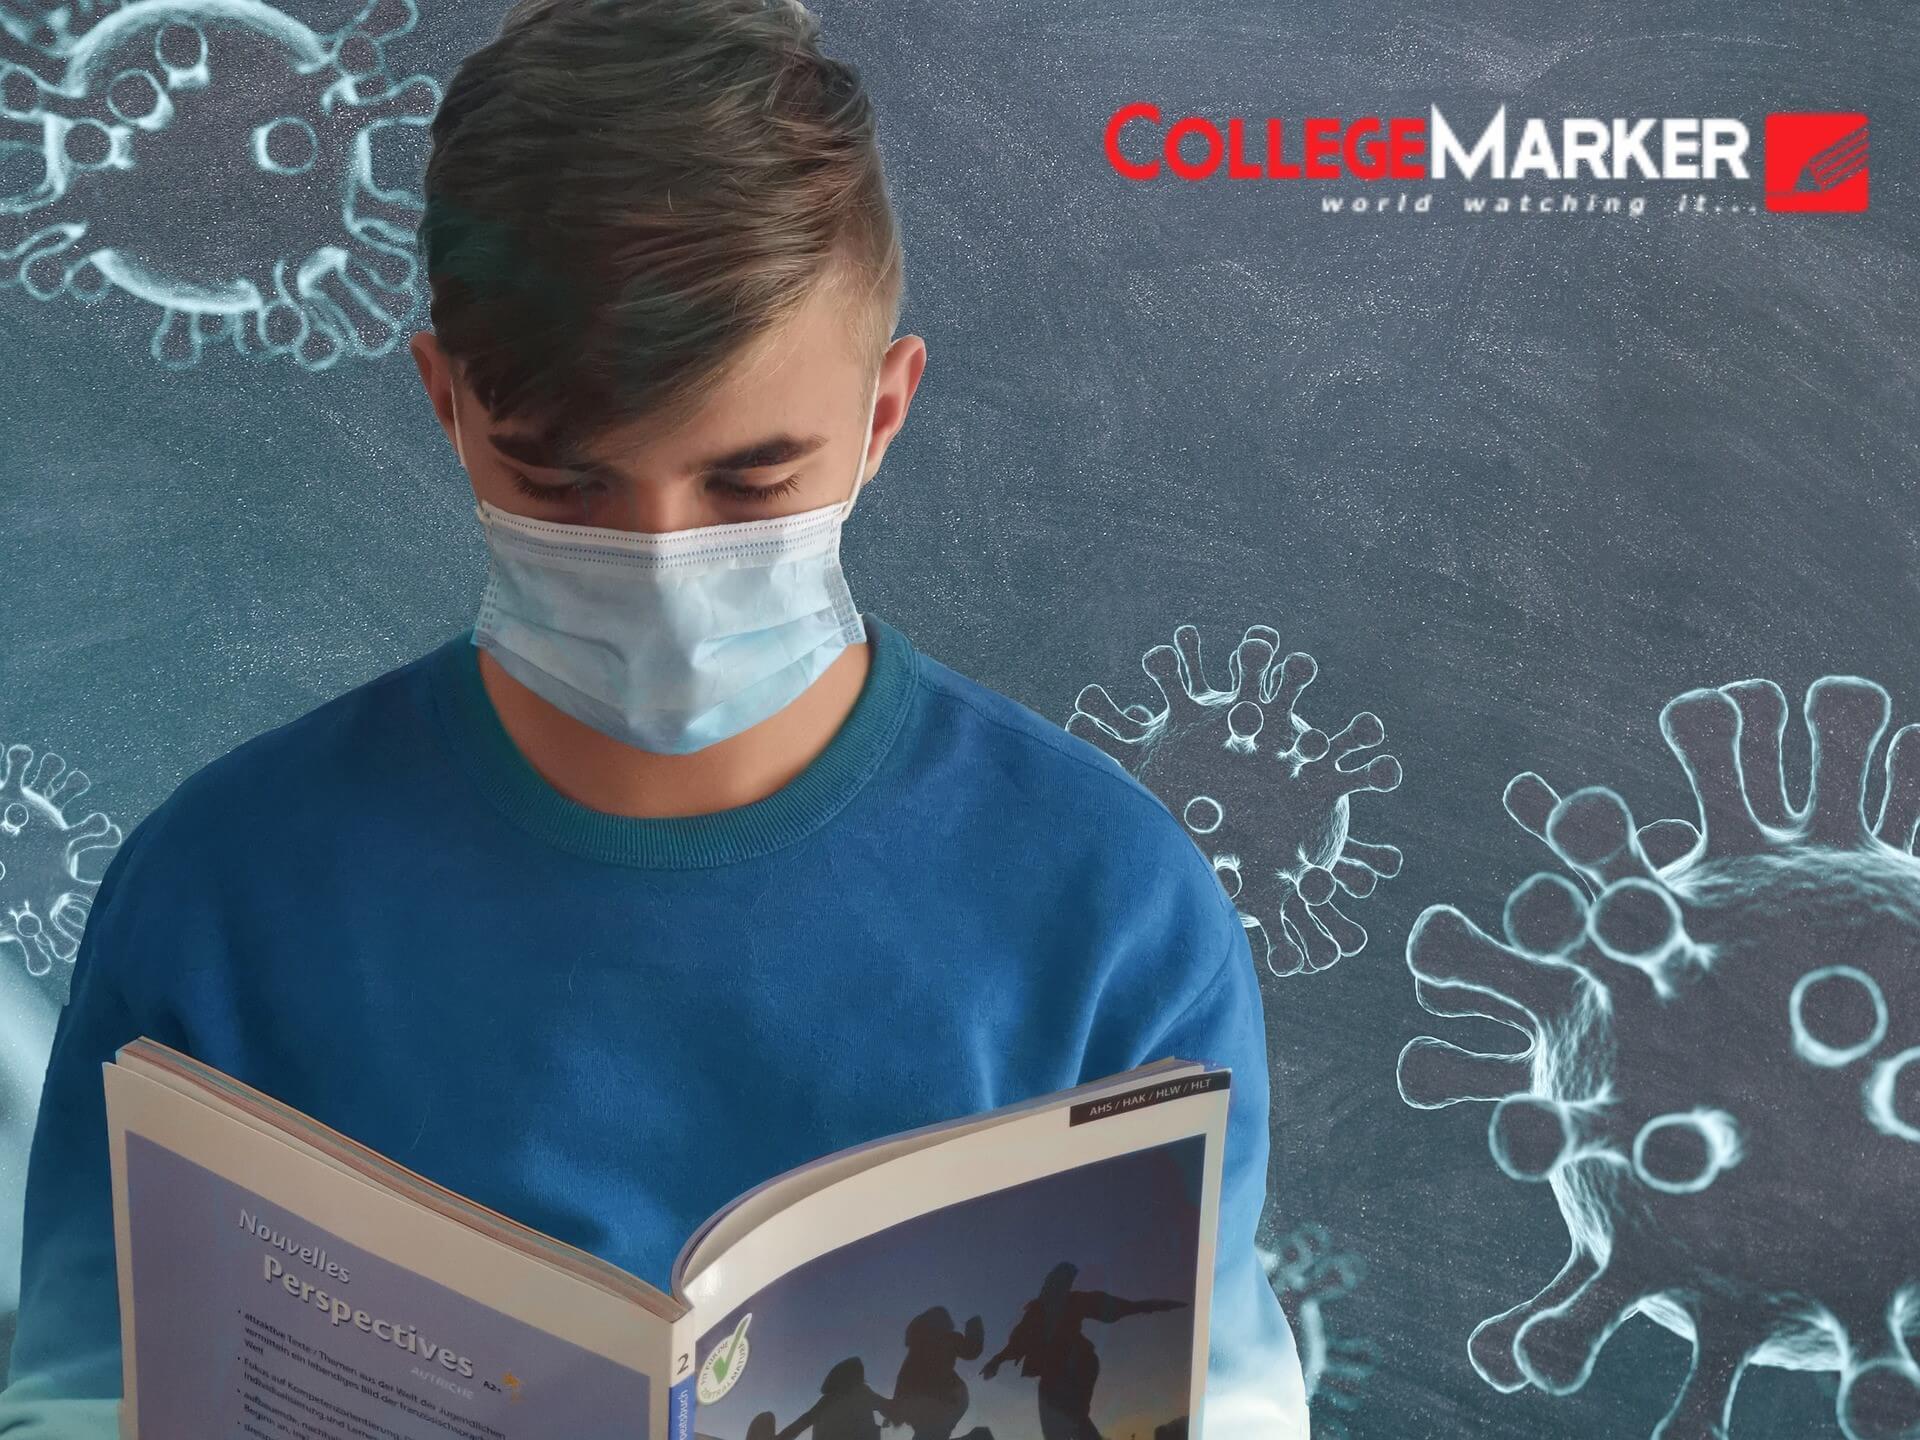 impact of coronavirus on students - CollegeMarker